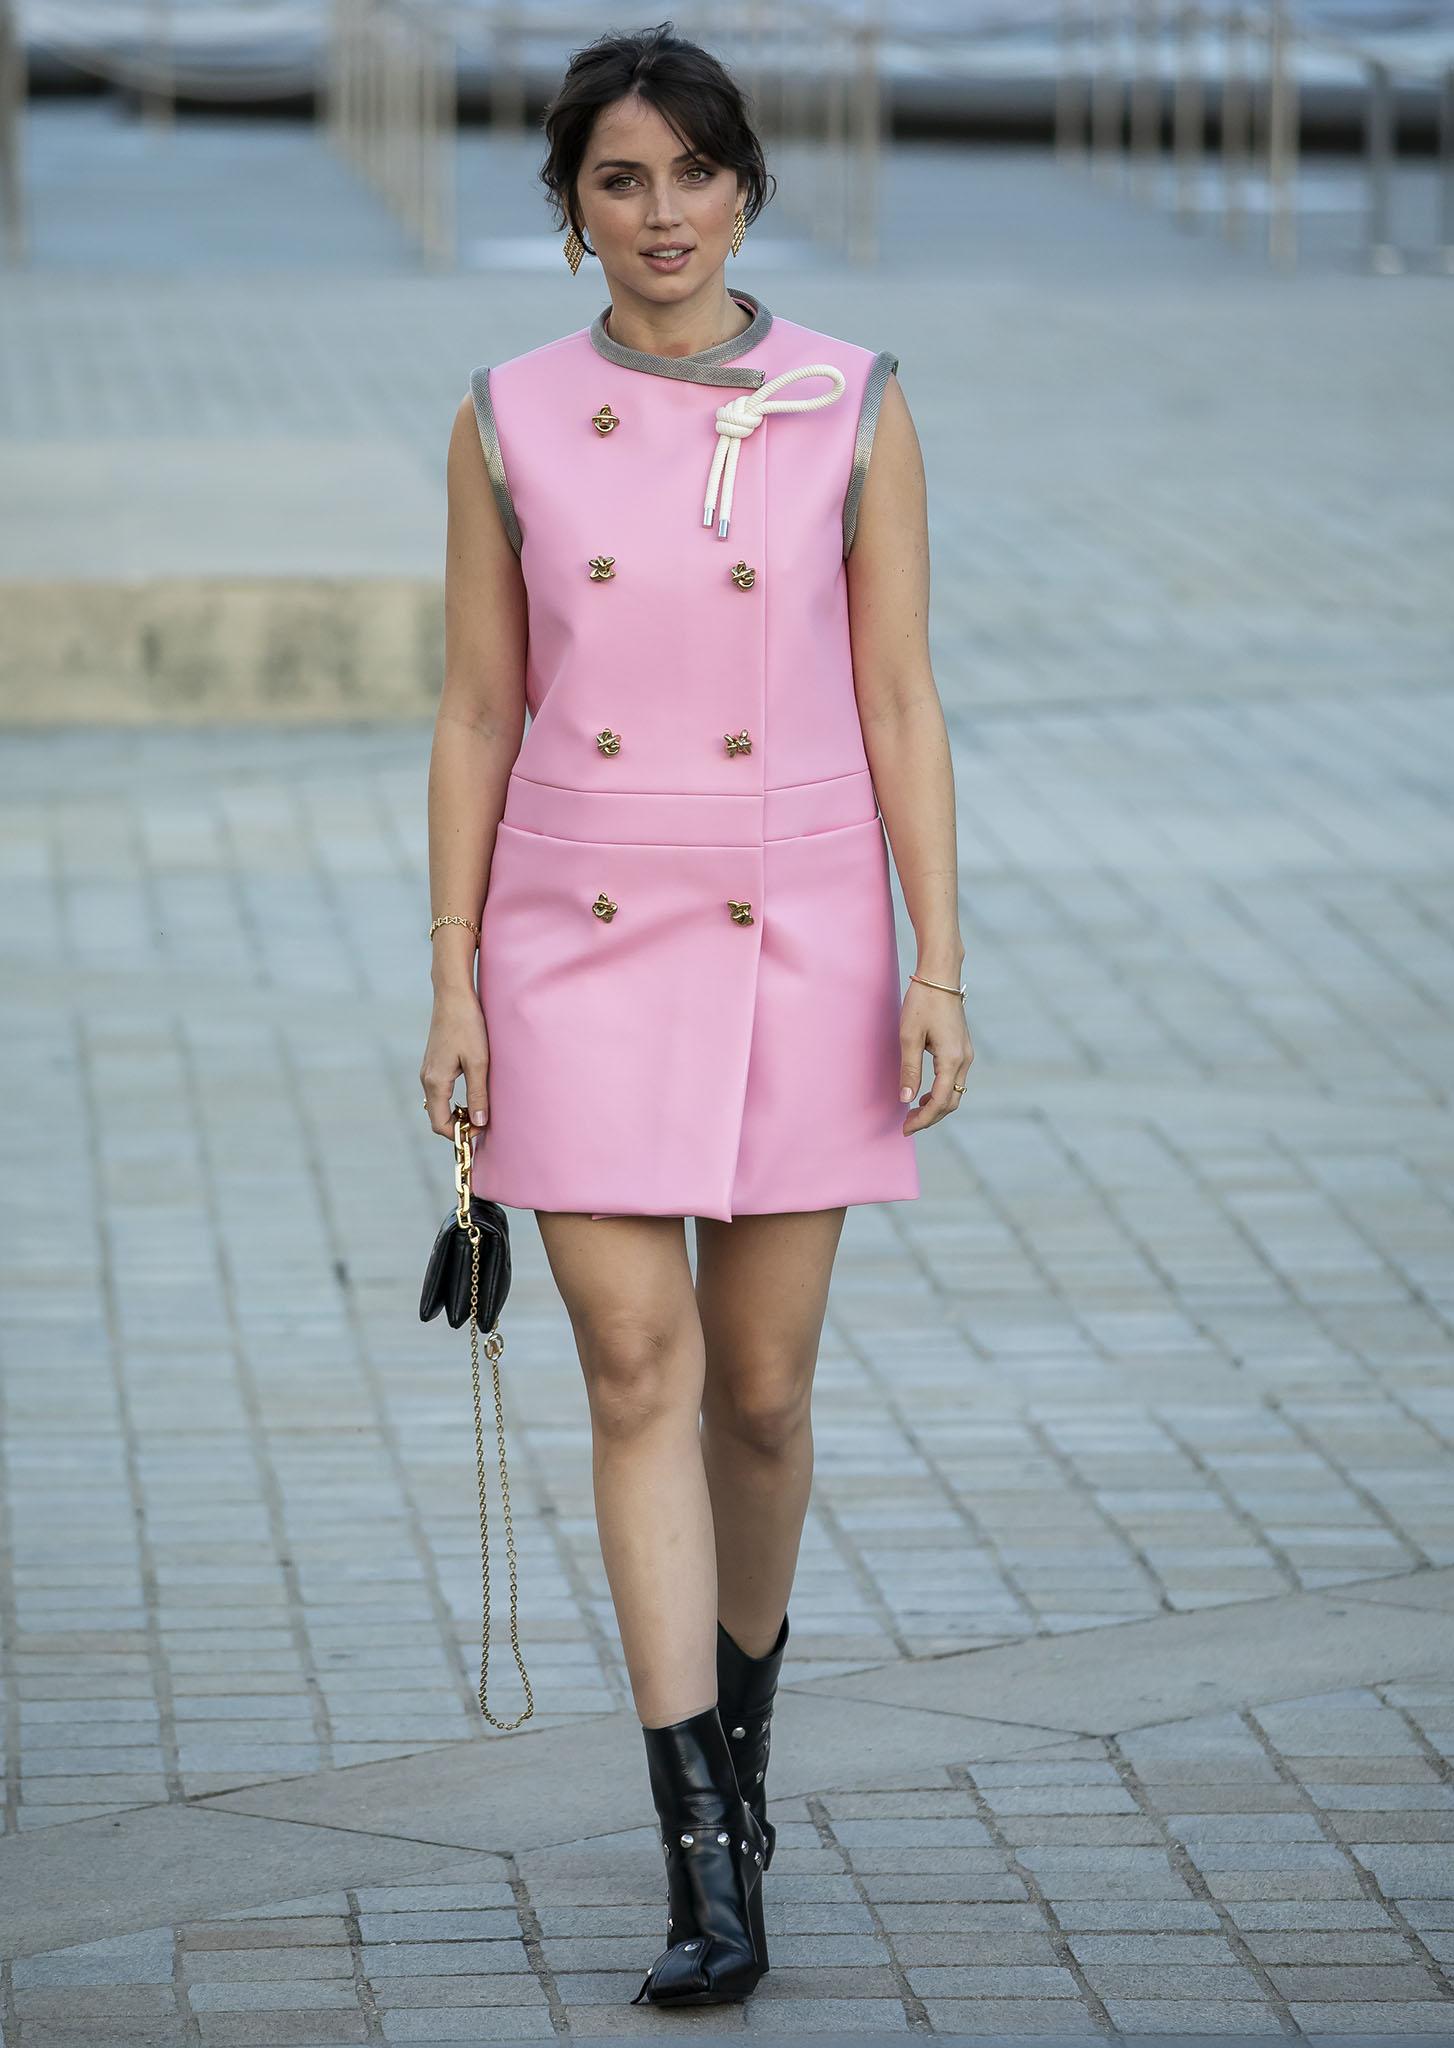 Ana de Armas showcases her legs in a '60s-style bubblegum pink Louis Vuitton Resort 2022 mini dress